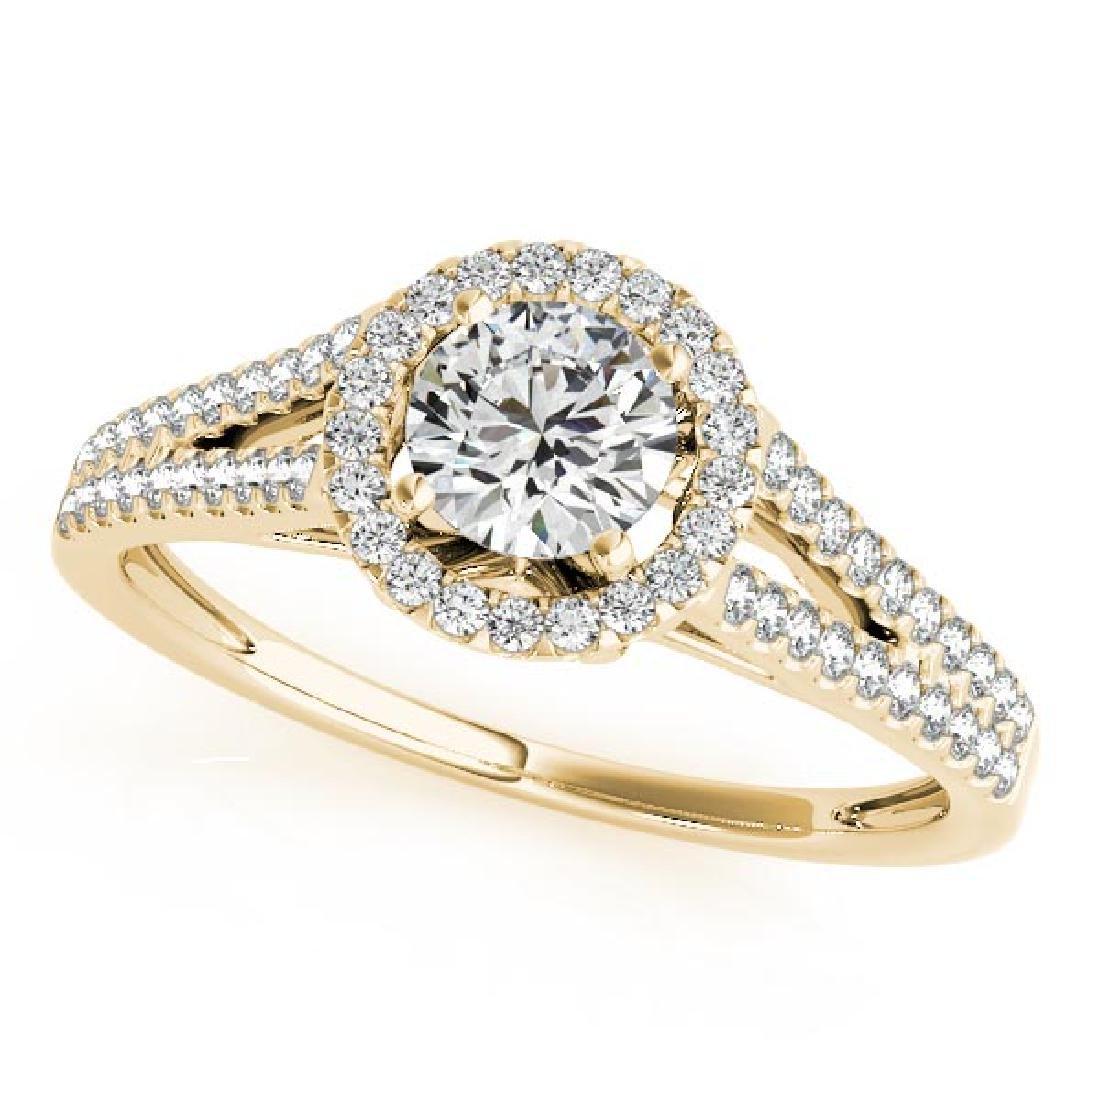 CERTIFIED 18K YELLOW GOLD 1.11 CT G-H/VS-SI1 DIAMOND HA